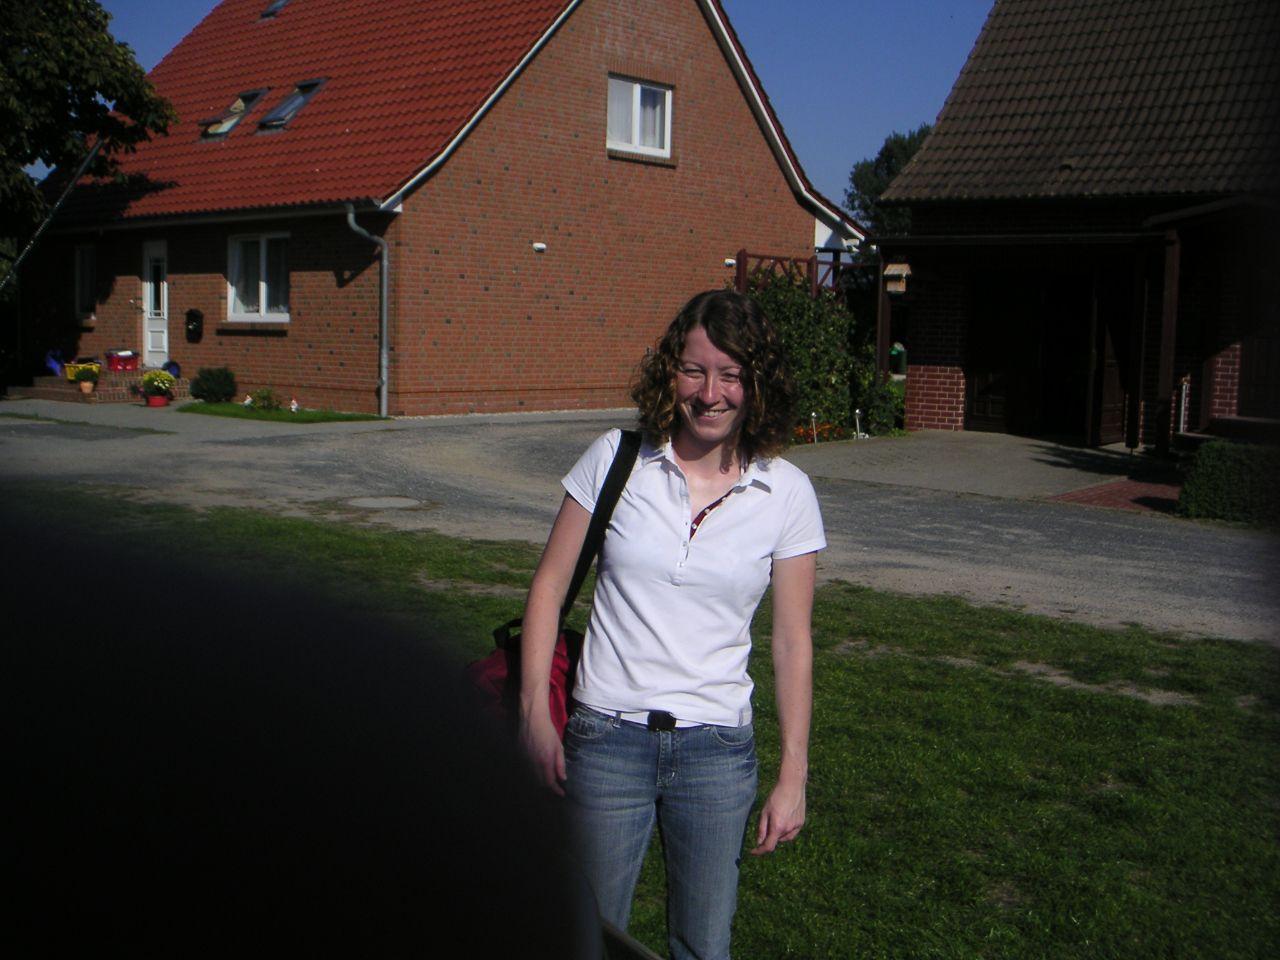 2006-09-13-poel-urlaub-nicolle-christian-25